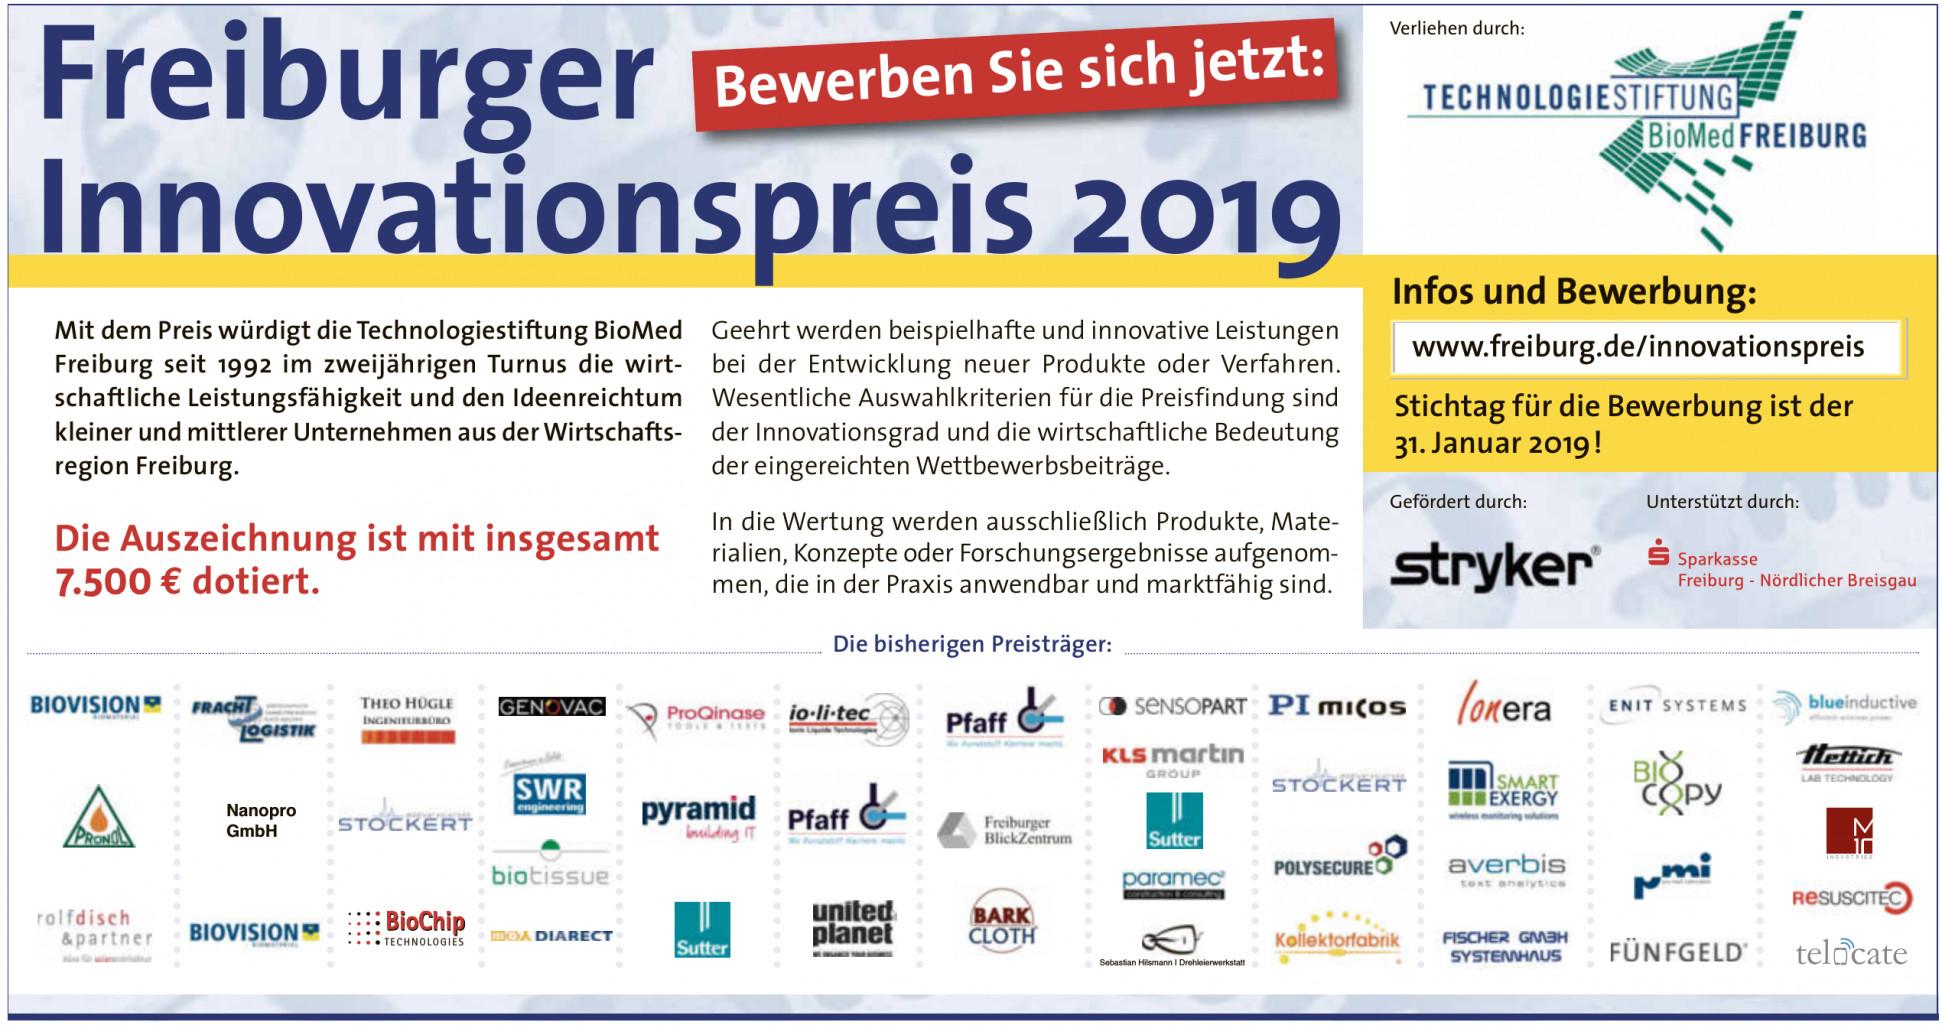 Technologiestiftung BioMed Freiburg